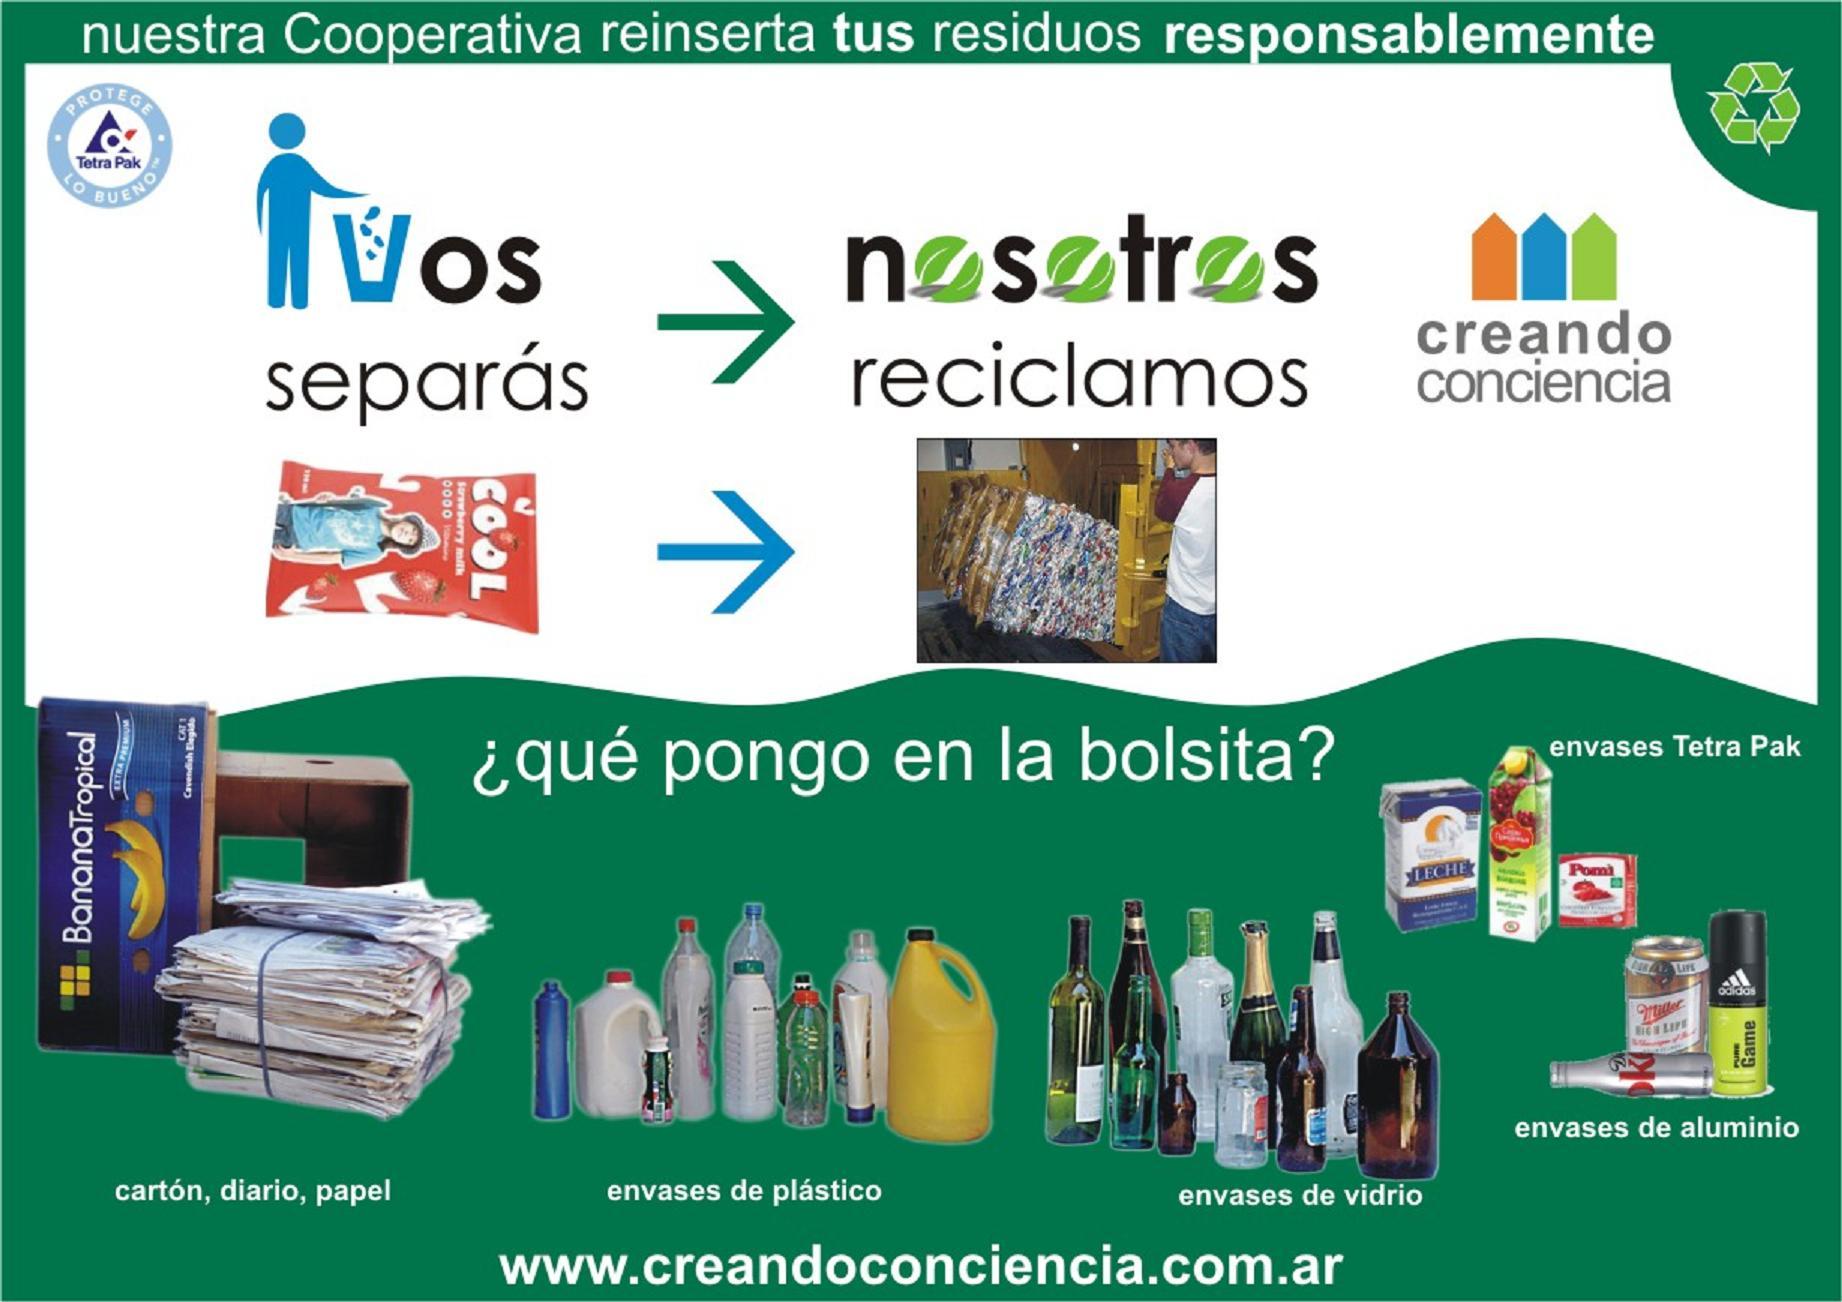 Cooperativa Creando Conciencia